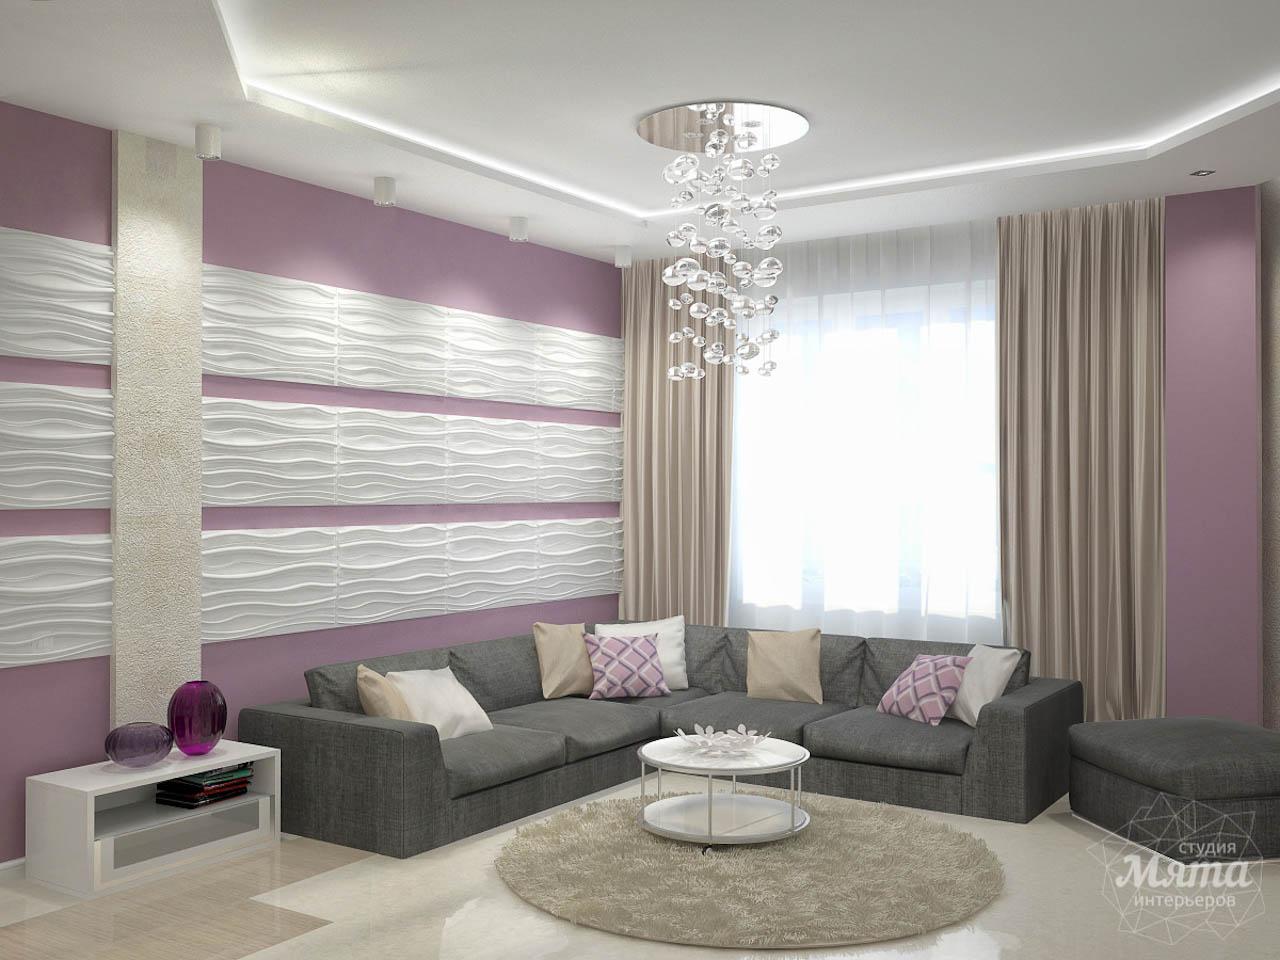 Дизайн интерьера и ремонт трехкомнатной квартиры по ул. Чкалова 124 img1354880209